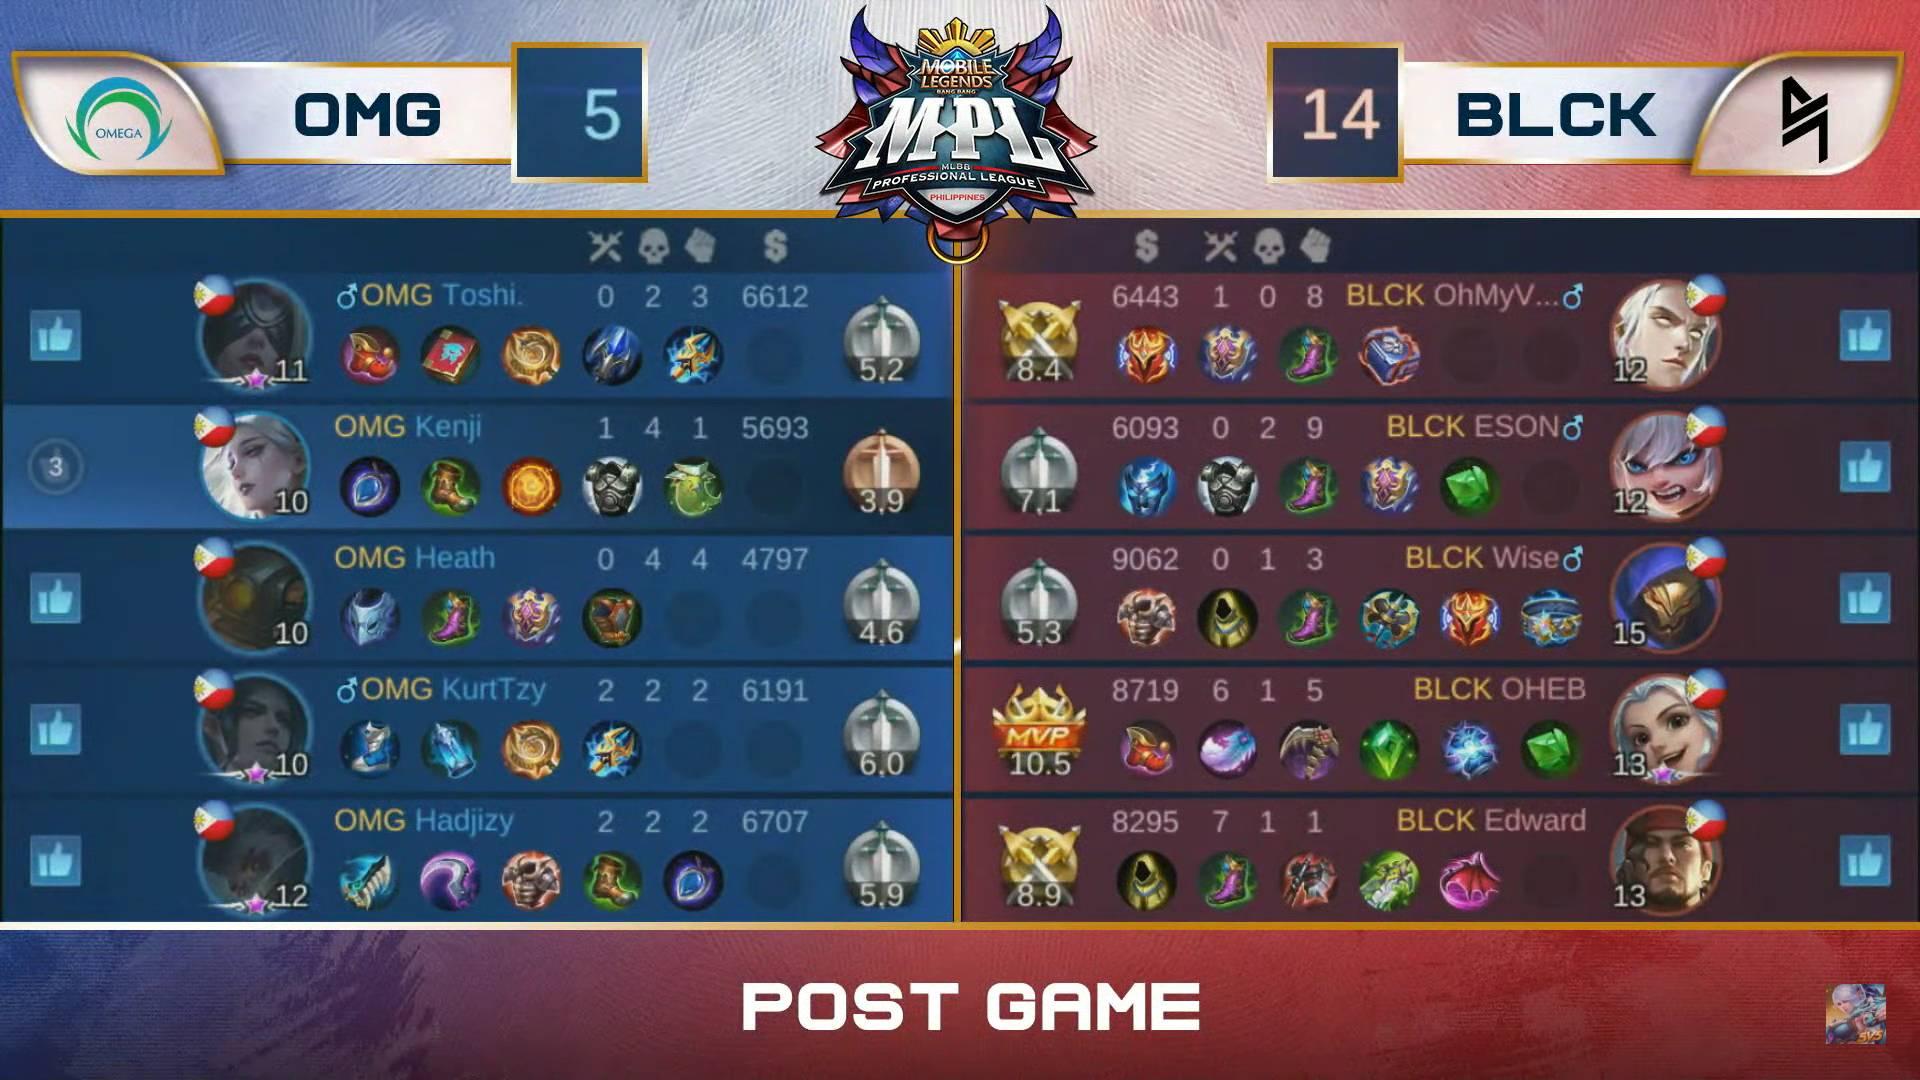 MPL-PH-Season-7-Blacklist-def-Omega-Game-2 Blacklist shocks Omega with Aldous, rises to 10-1 in MPL PH ESports Mobile Legends MPL-PH News  - philippine sports news